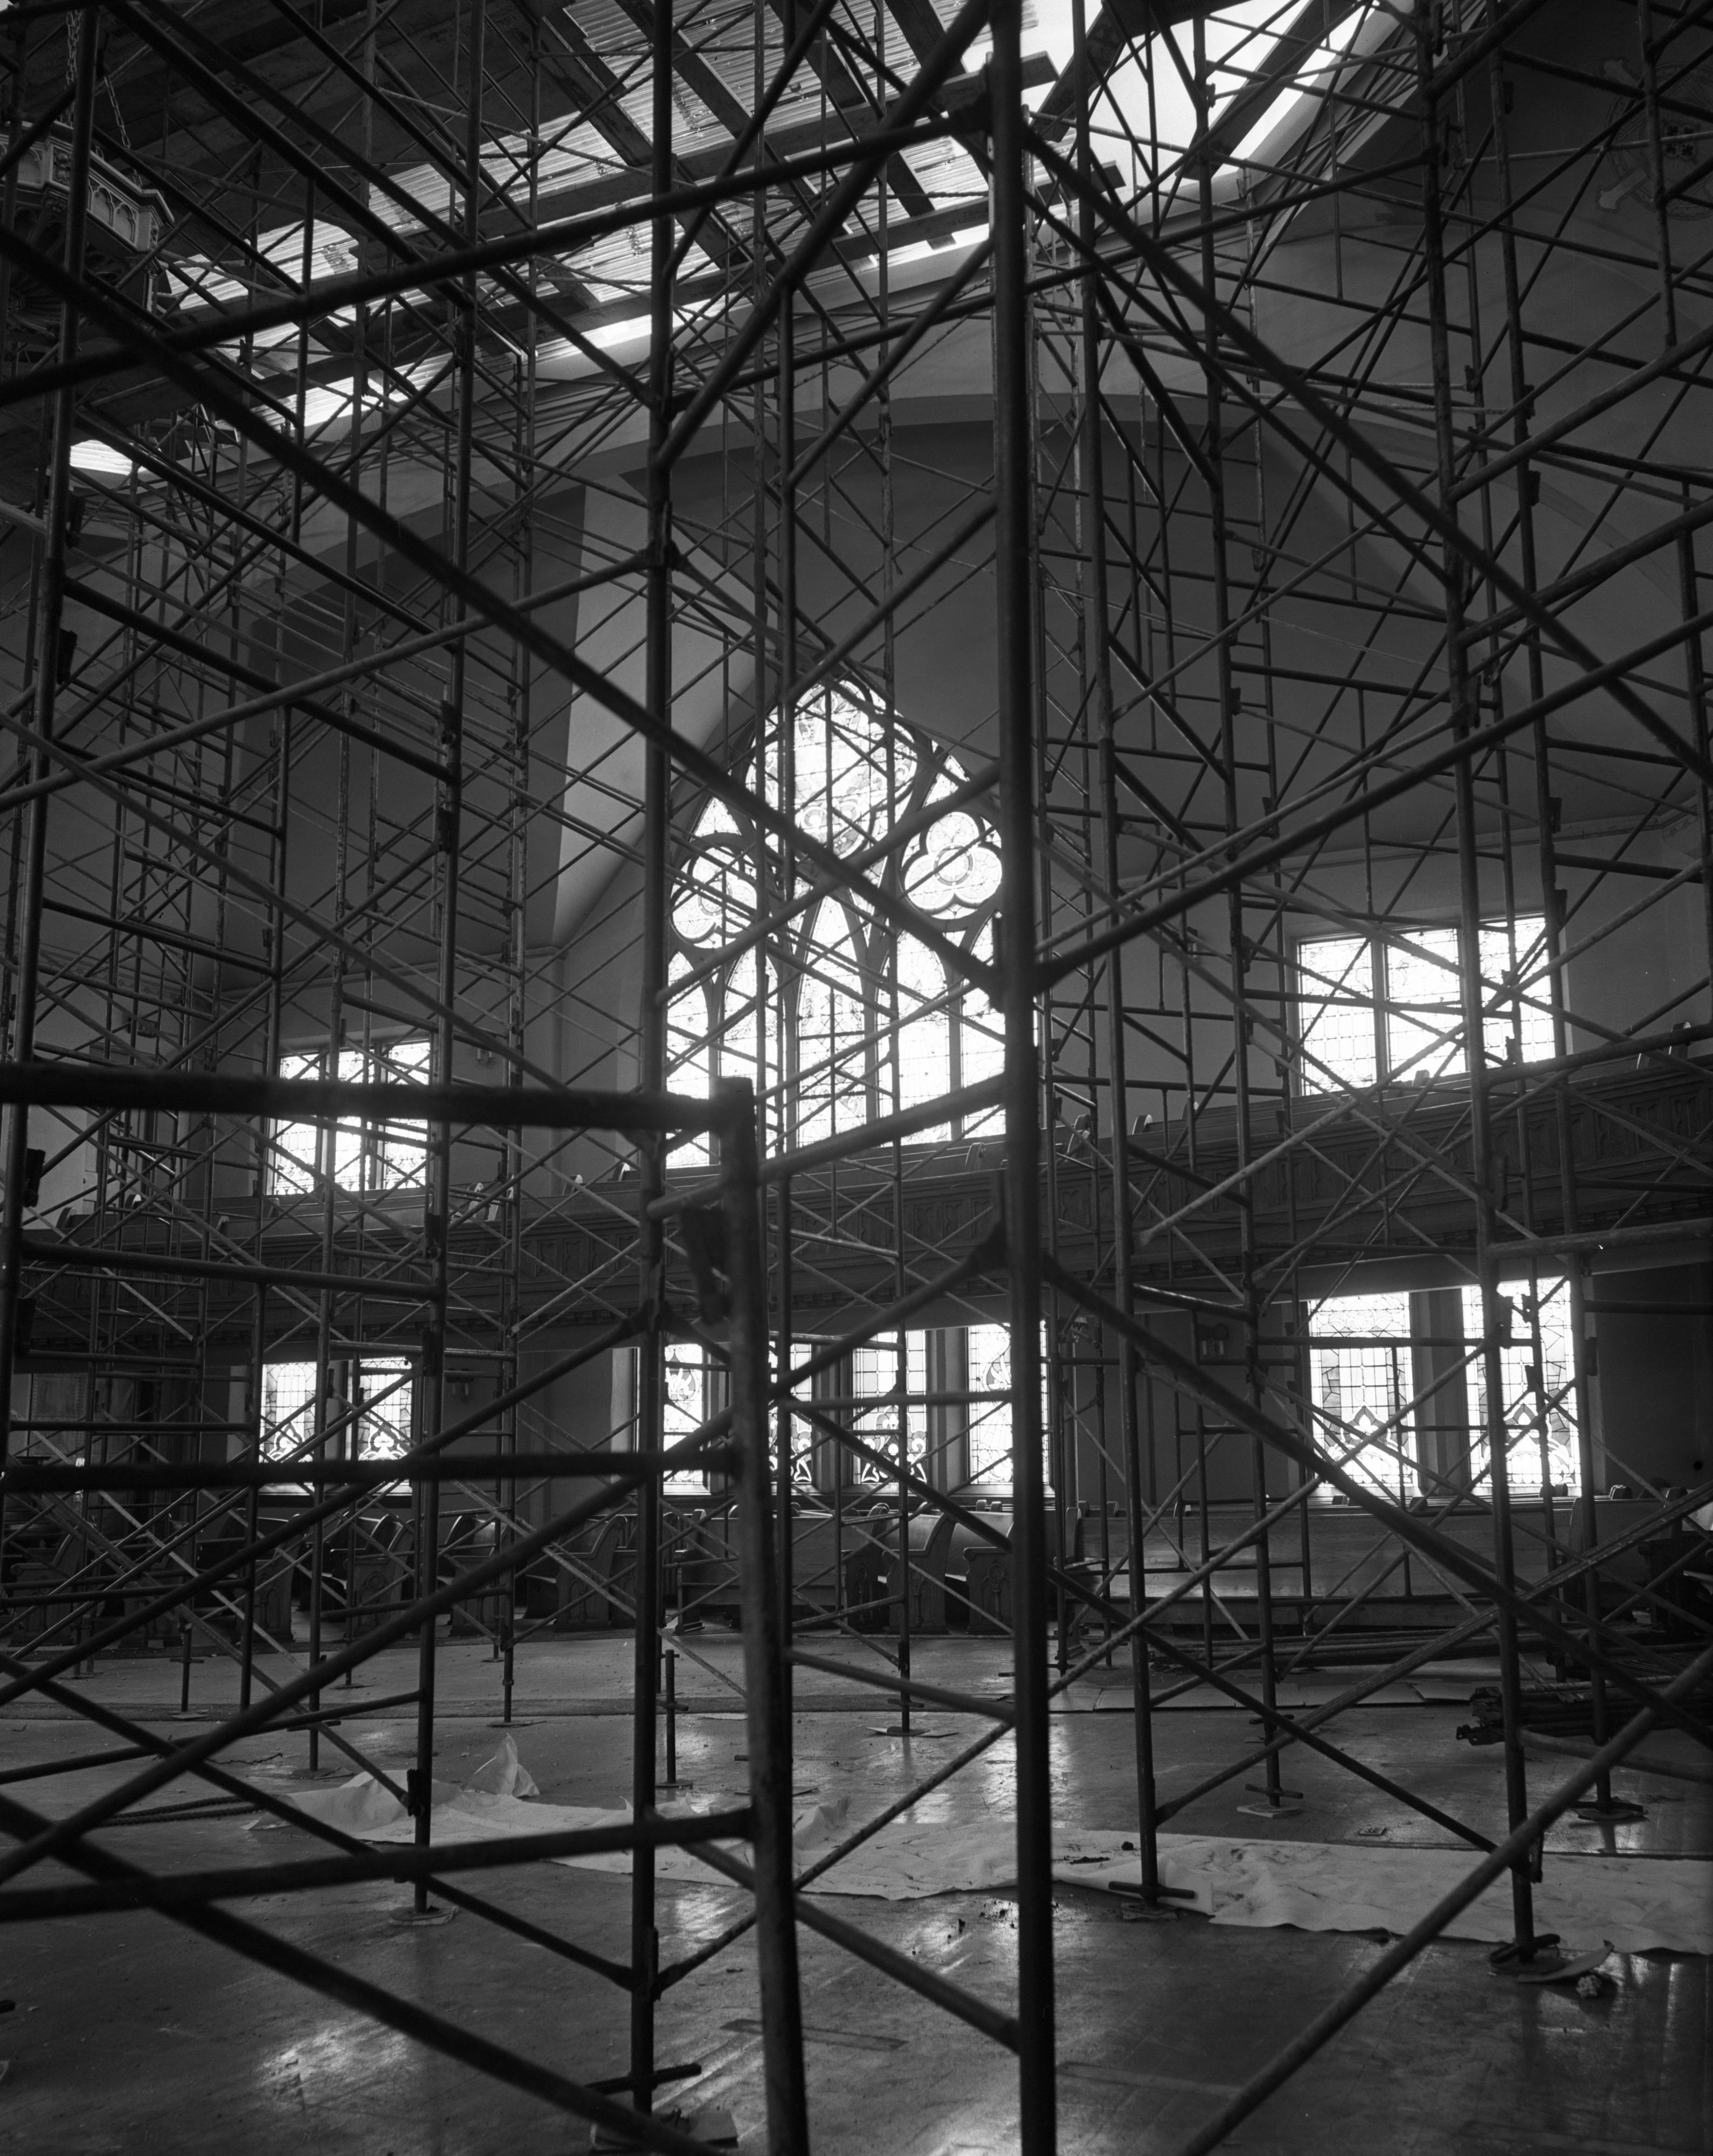 multipoint corner ny scaffolding casino seneca interior services niagara front adj suspended superior project falls scaffold